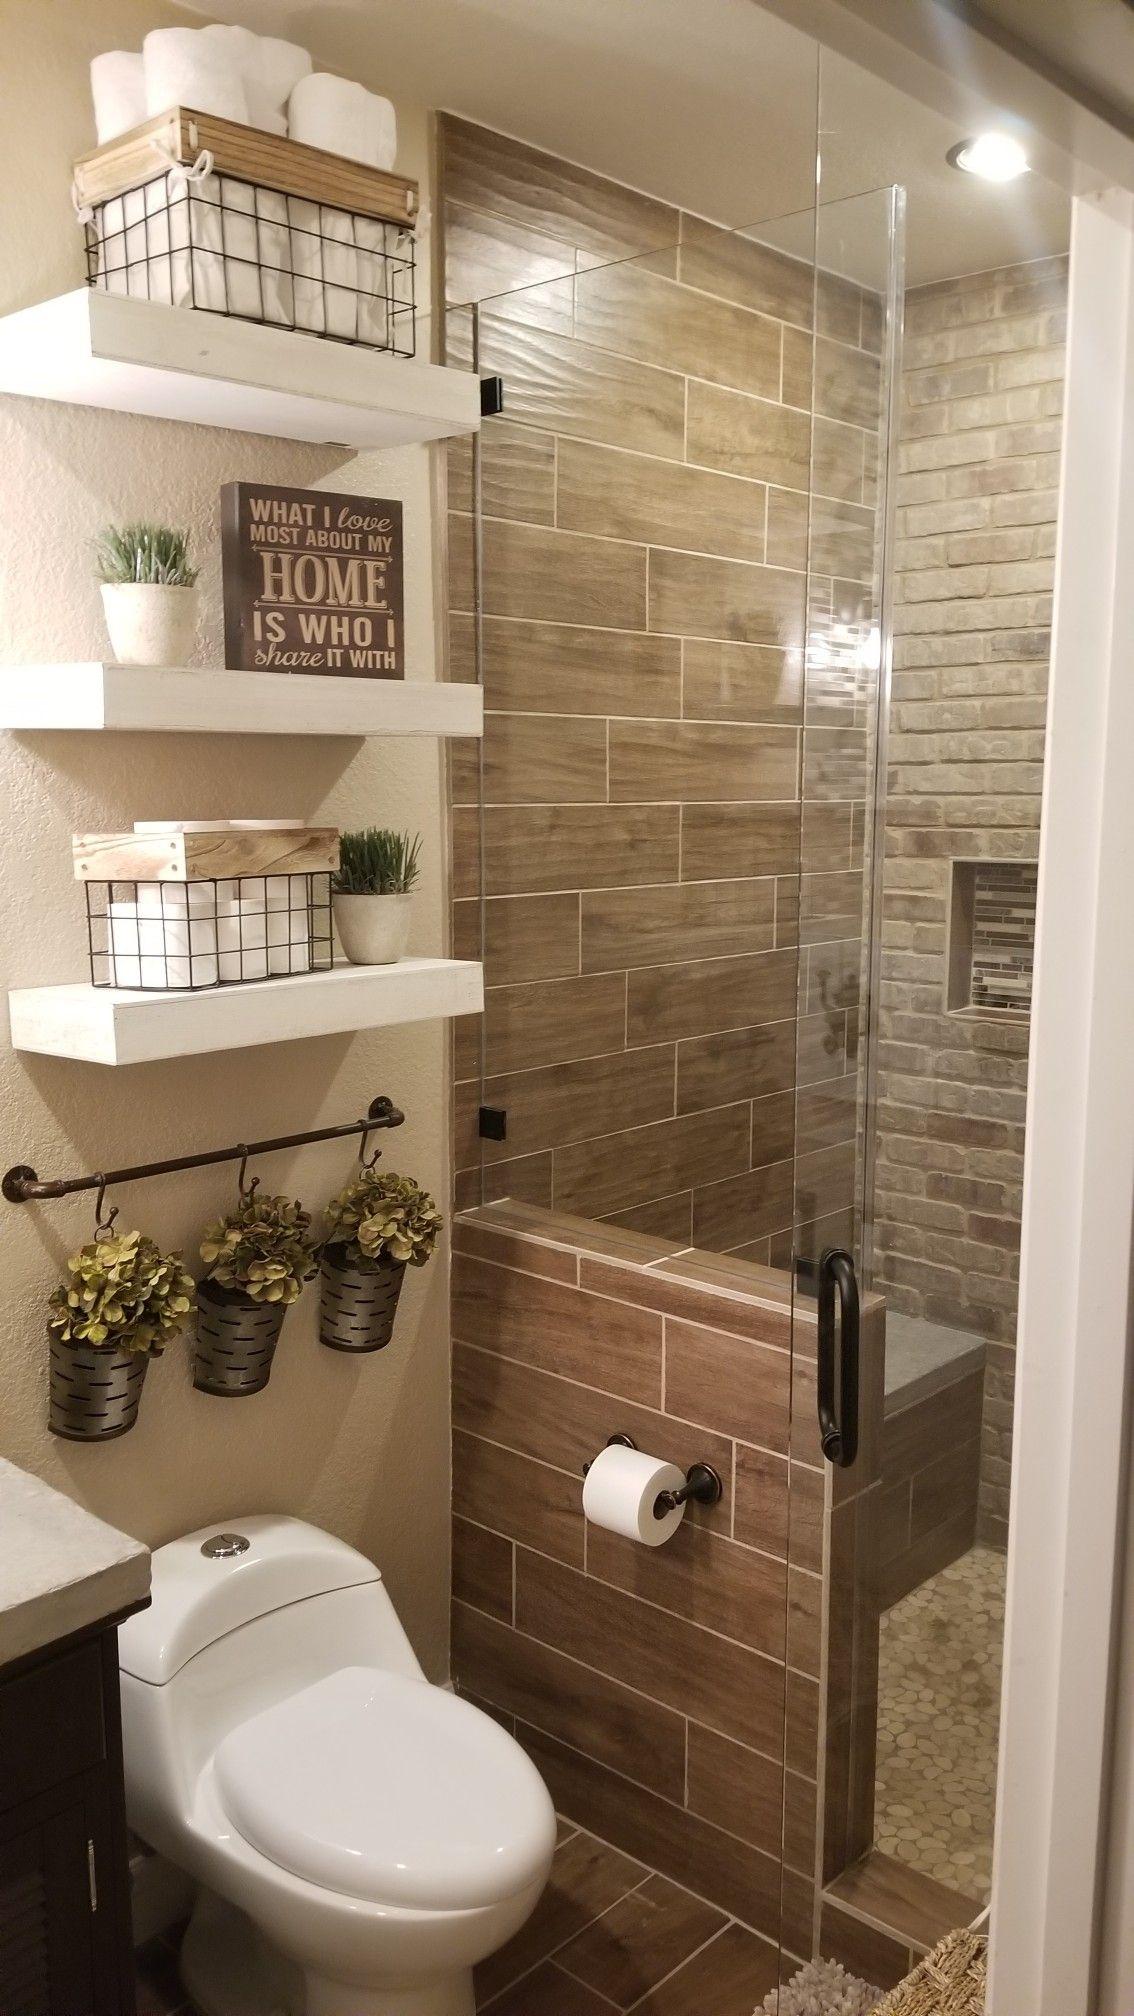 Guest Bathroom Decor Small Bathroom Remodel Bathrooms Remodel Small Bathroom